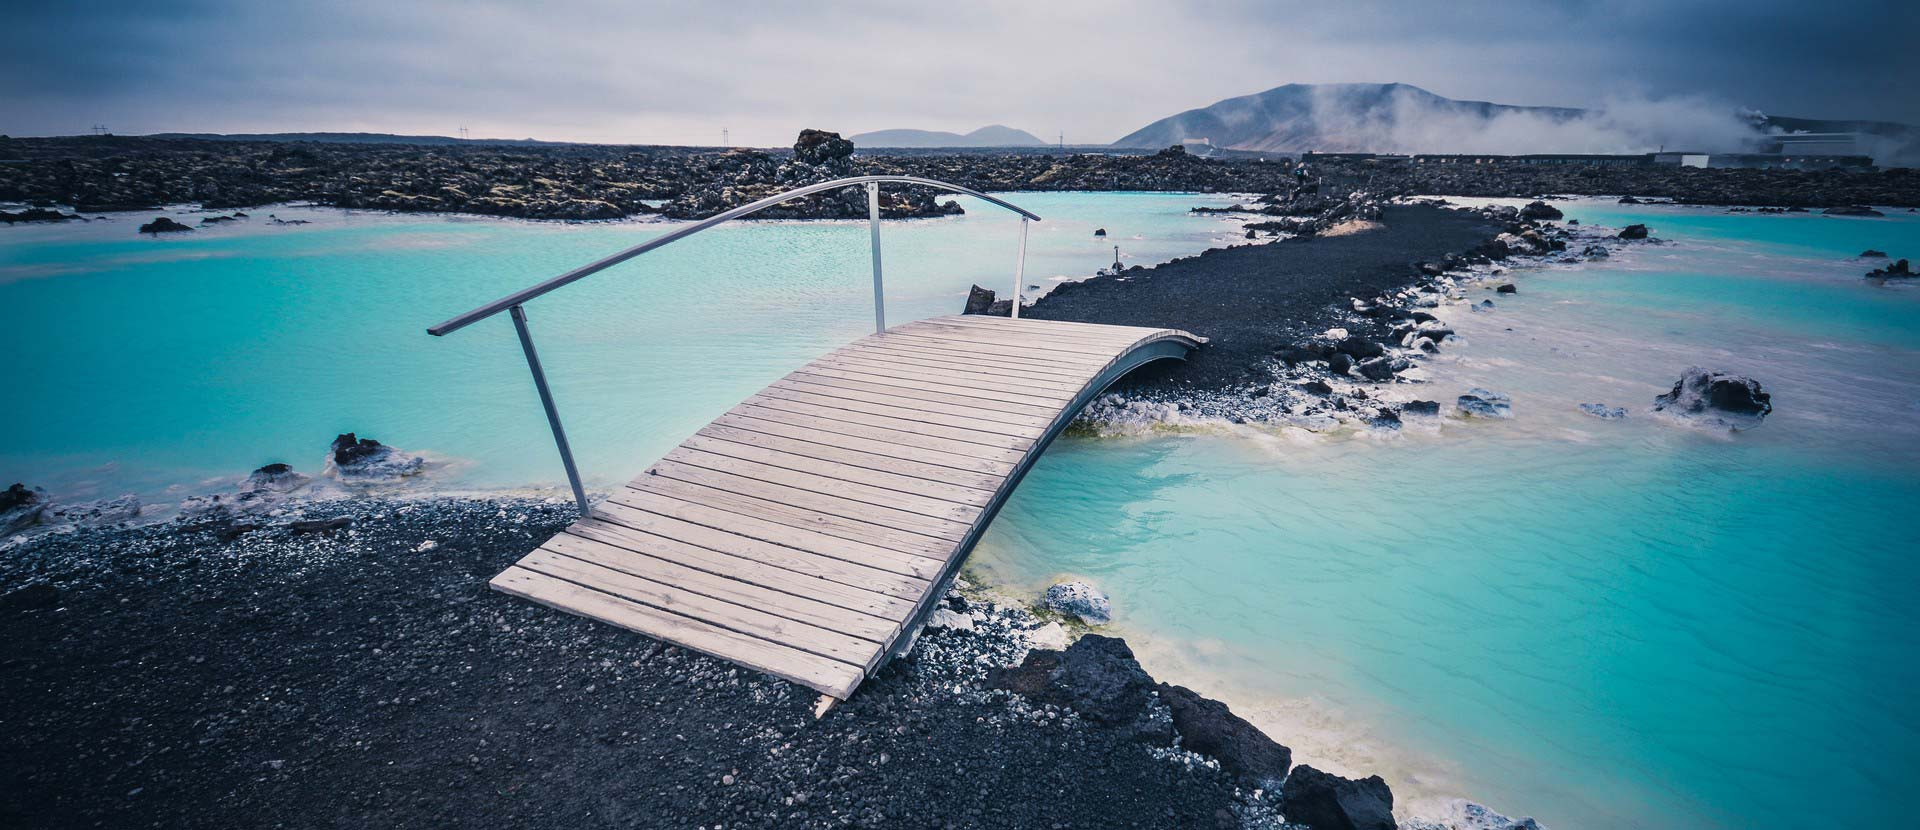 Blue Lagoon Iceland A Winter Wonderland A Luxury Spa